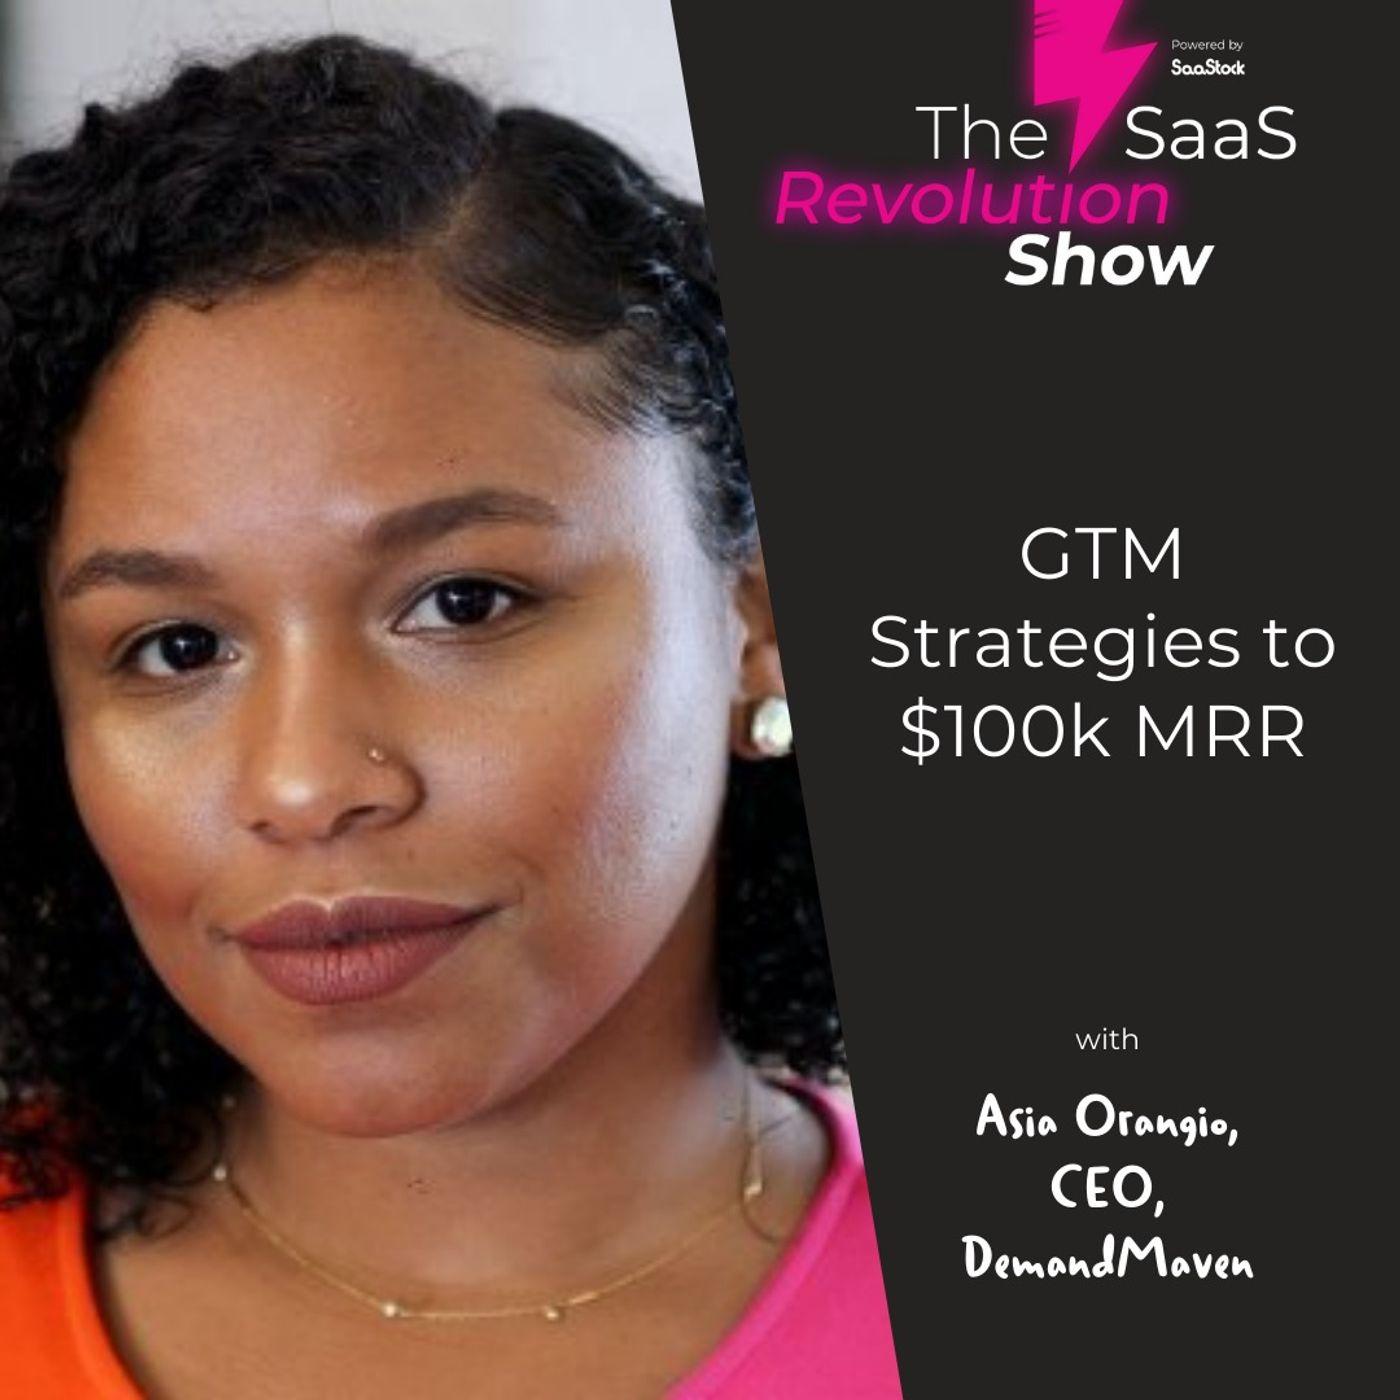 GTM Strategies to $100k MRR, with Asia Orangio (CEO of DemandMaven)